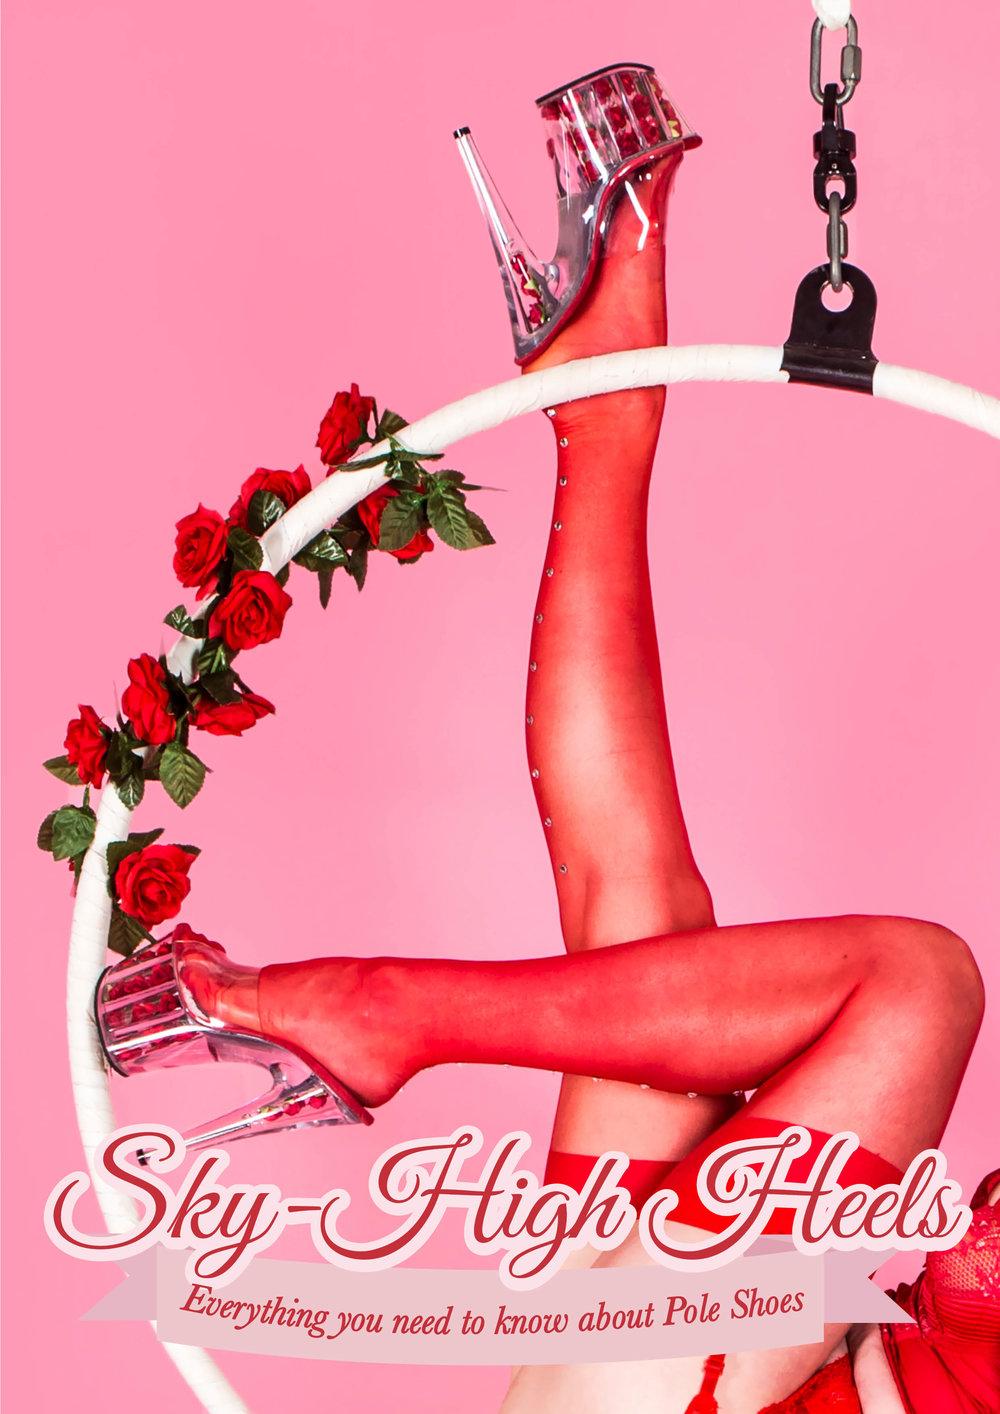 Sky-High-Heels-Banner.jpg